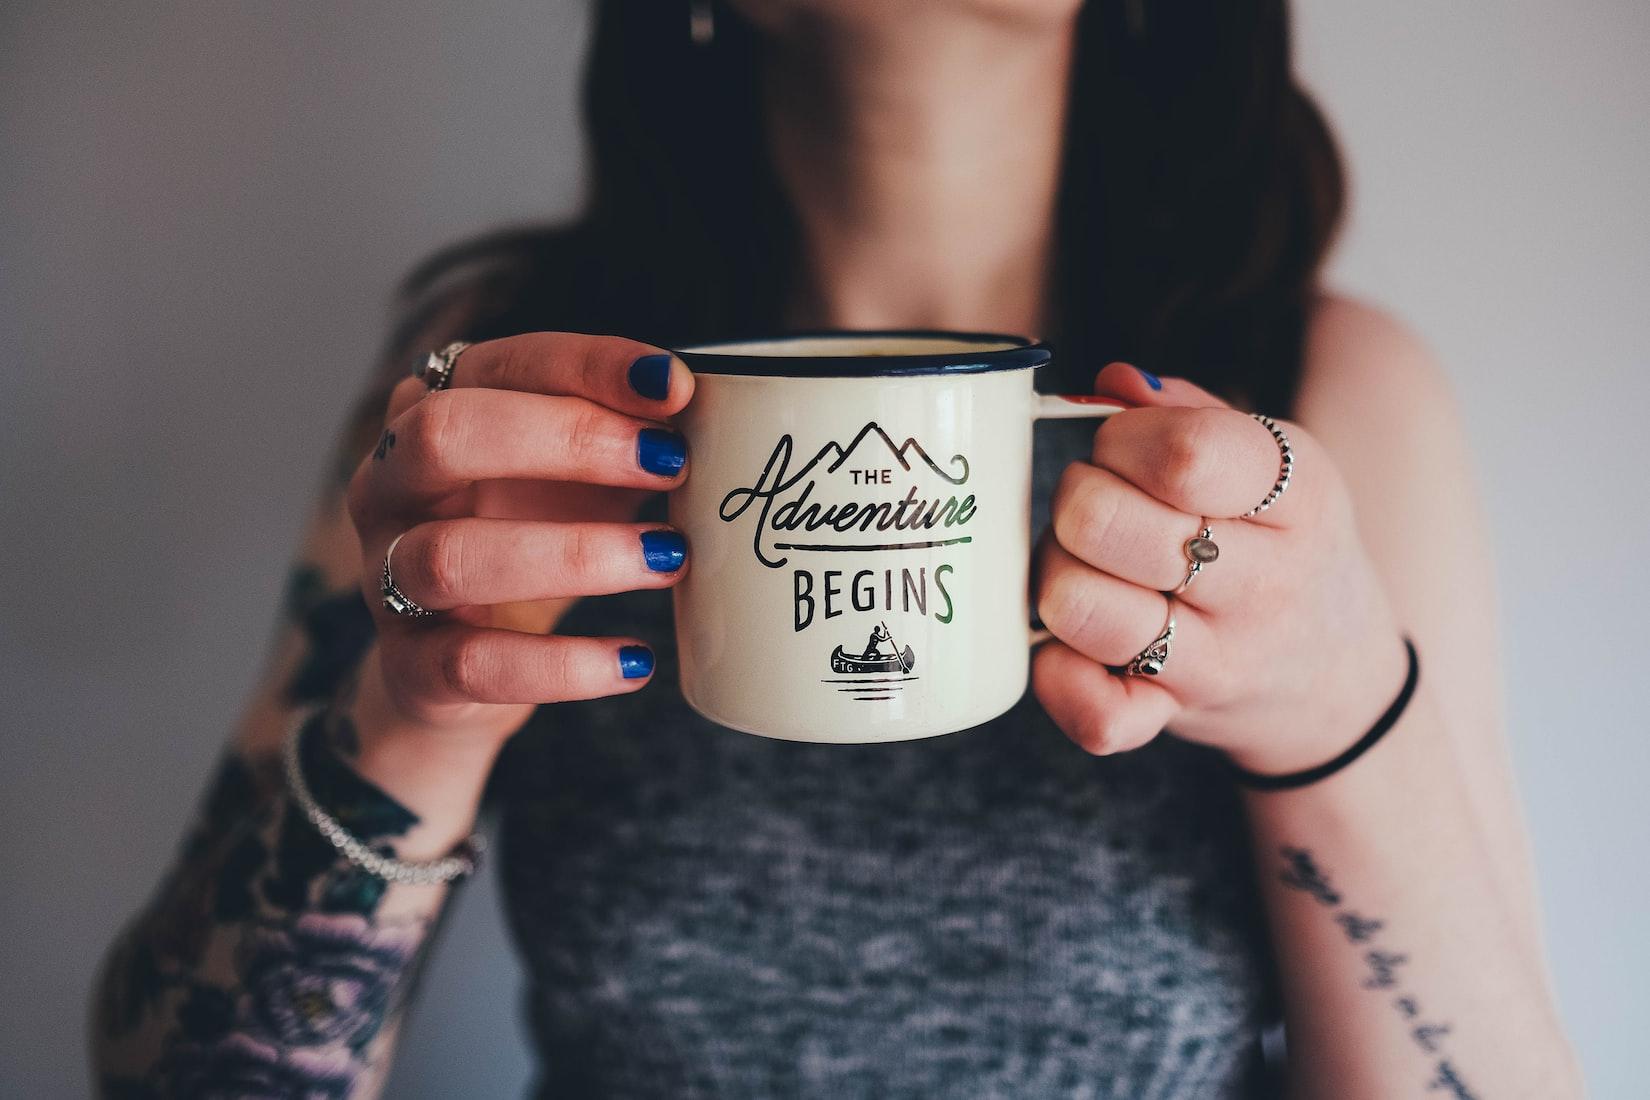 Comment gagner de l'argent avec son blog en 2021, Le guide 2021 pour les blogueurs, Blog, Blogging, Blogueur, Monétisation, Gagner de l'argent, Affiliation, Digital Nomad, Community Manager, Social Media Manager, Devenir Digital Nomad, Gagner de l'argent en ligne, Gagner argent Blog